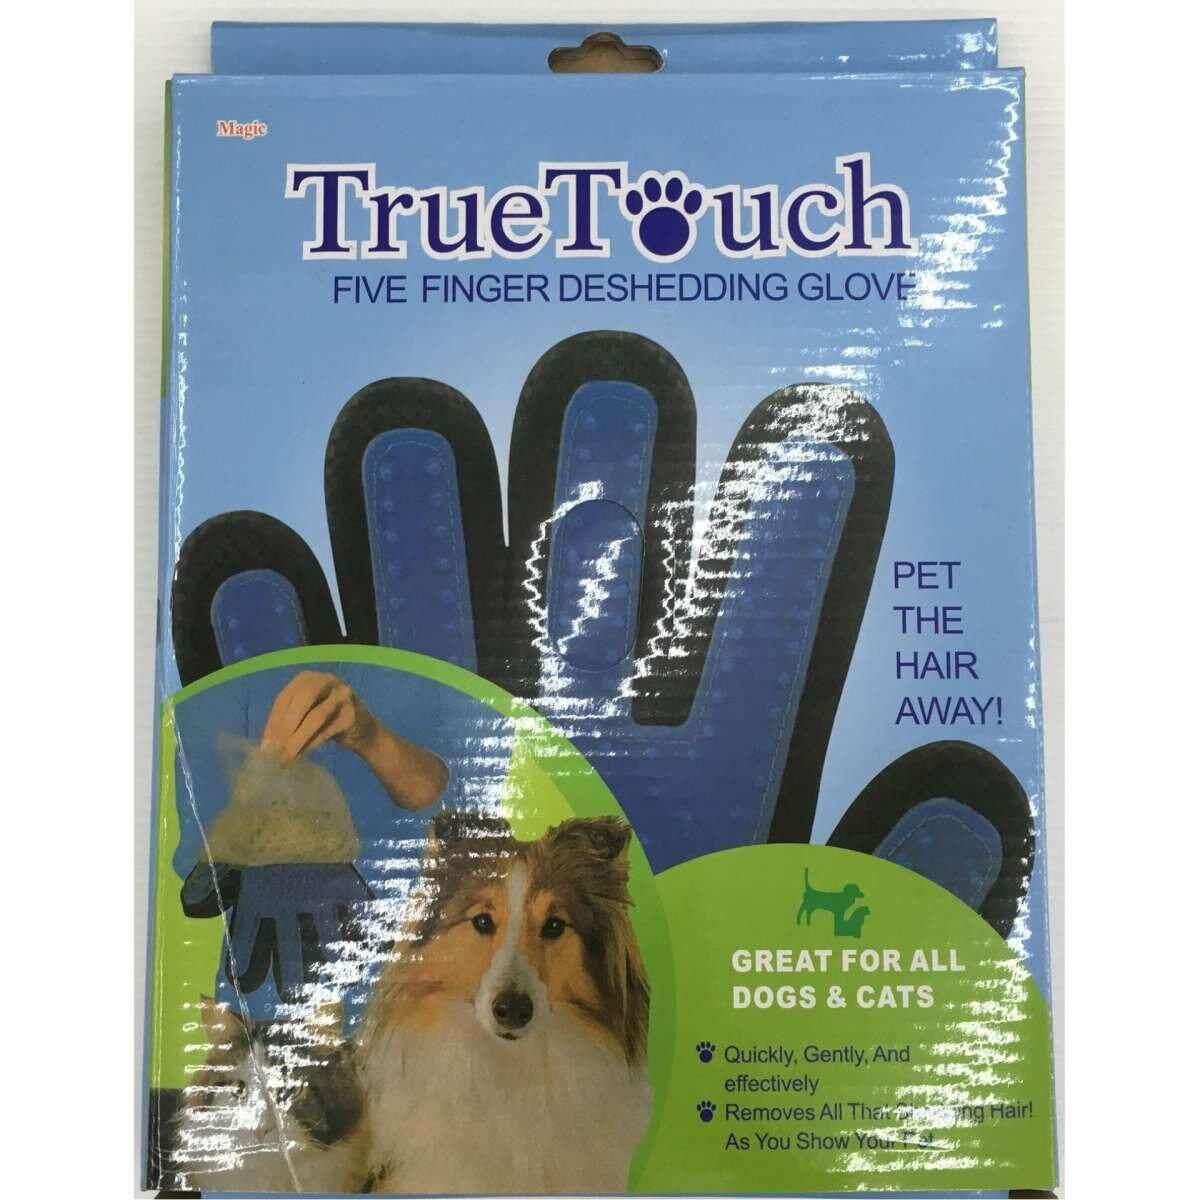 True Touch Five Finger Deshedding Glove ถุงมือ แปรงขนสำหรับสุนัข และแมว 1 ข้าง พร้อมกล่อง By Bomb Petshop.